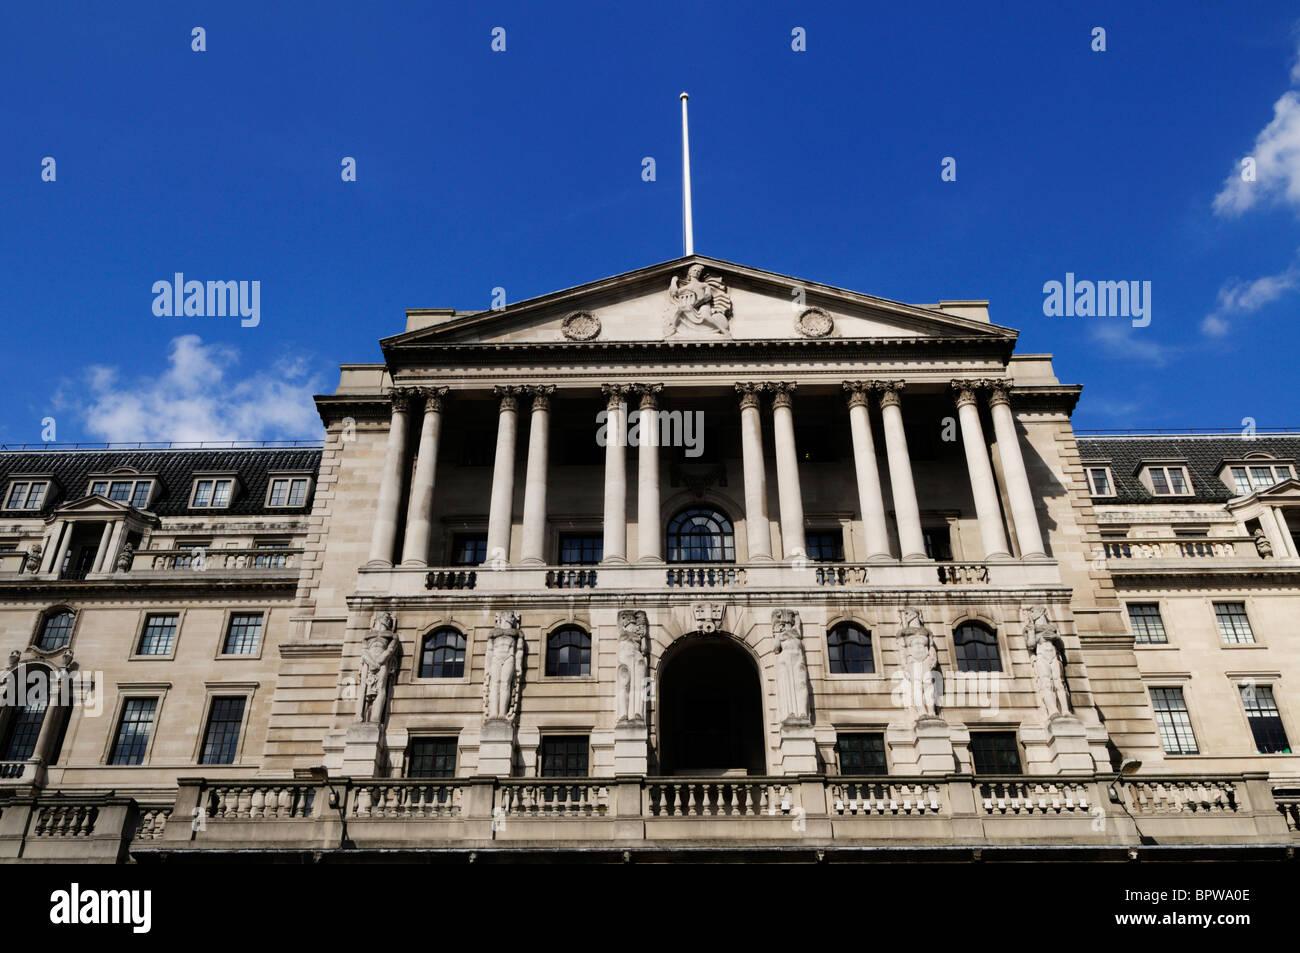 Facade of the Bank of England, Threadneedle Street, London, England, UK - Stock Image